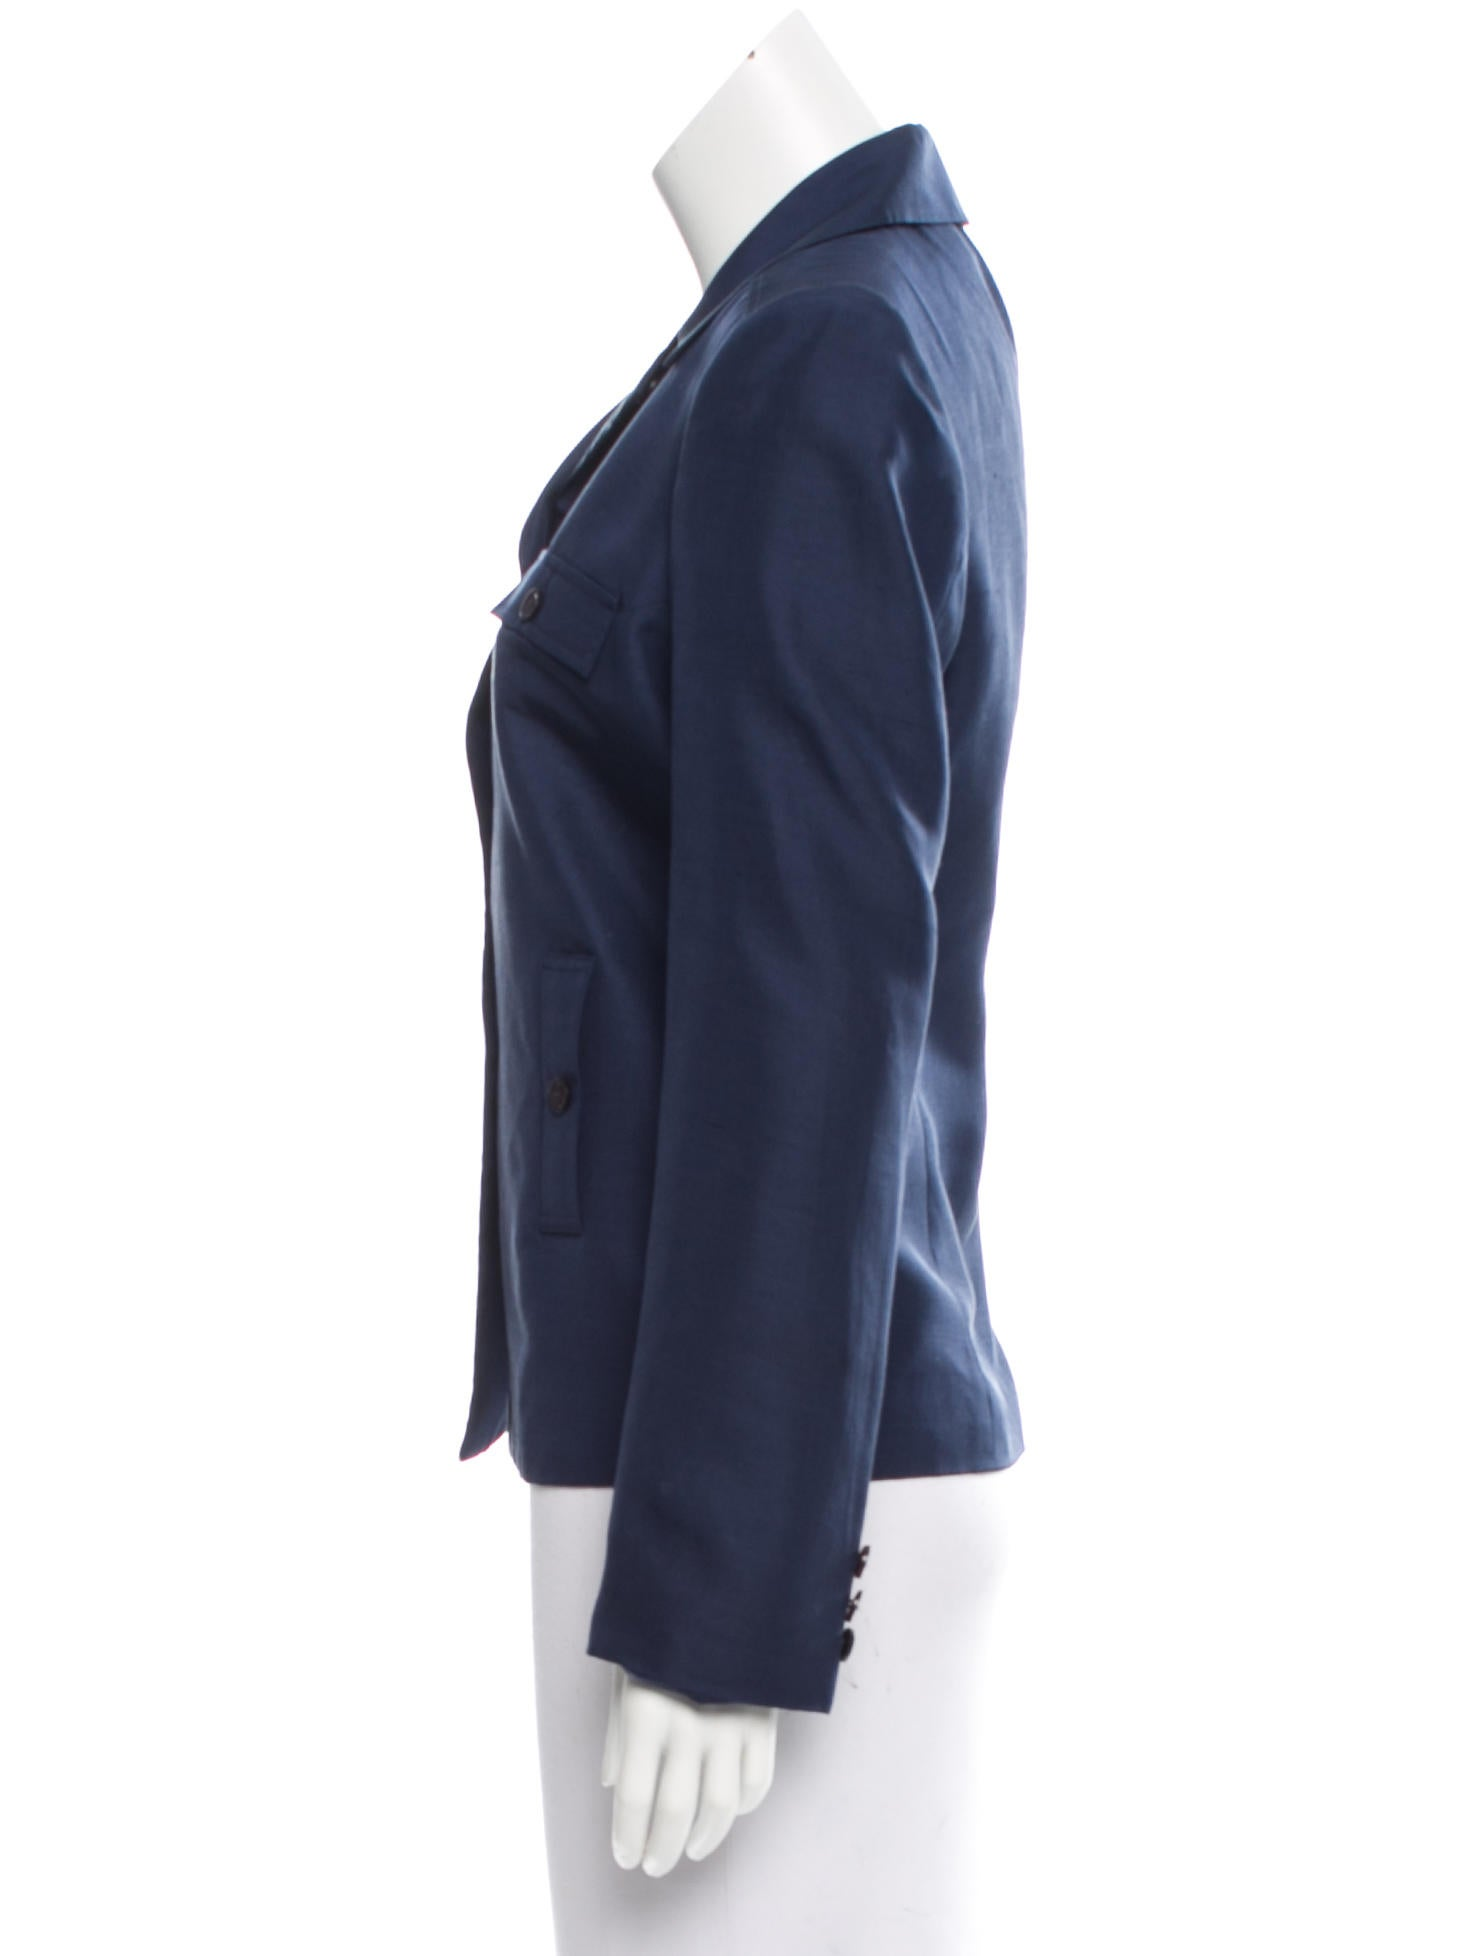 Magaschoni Lightweight Long Sleeve Jacket Clothing